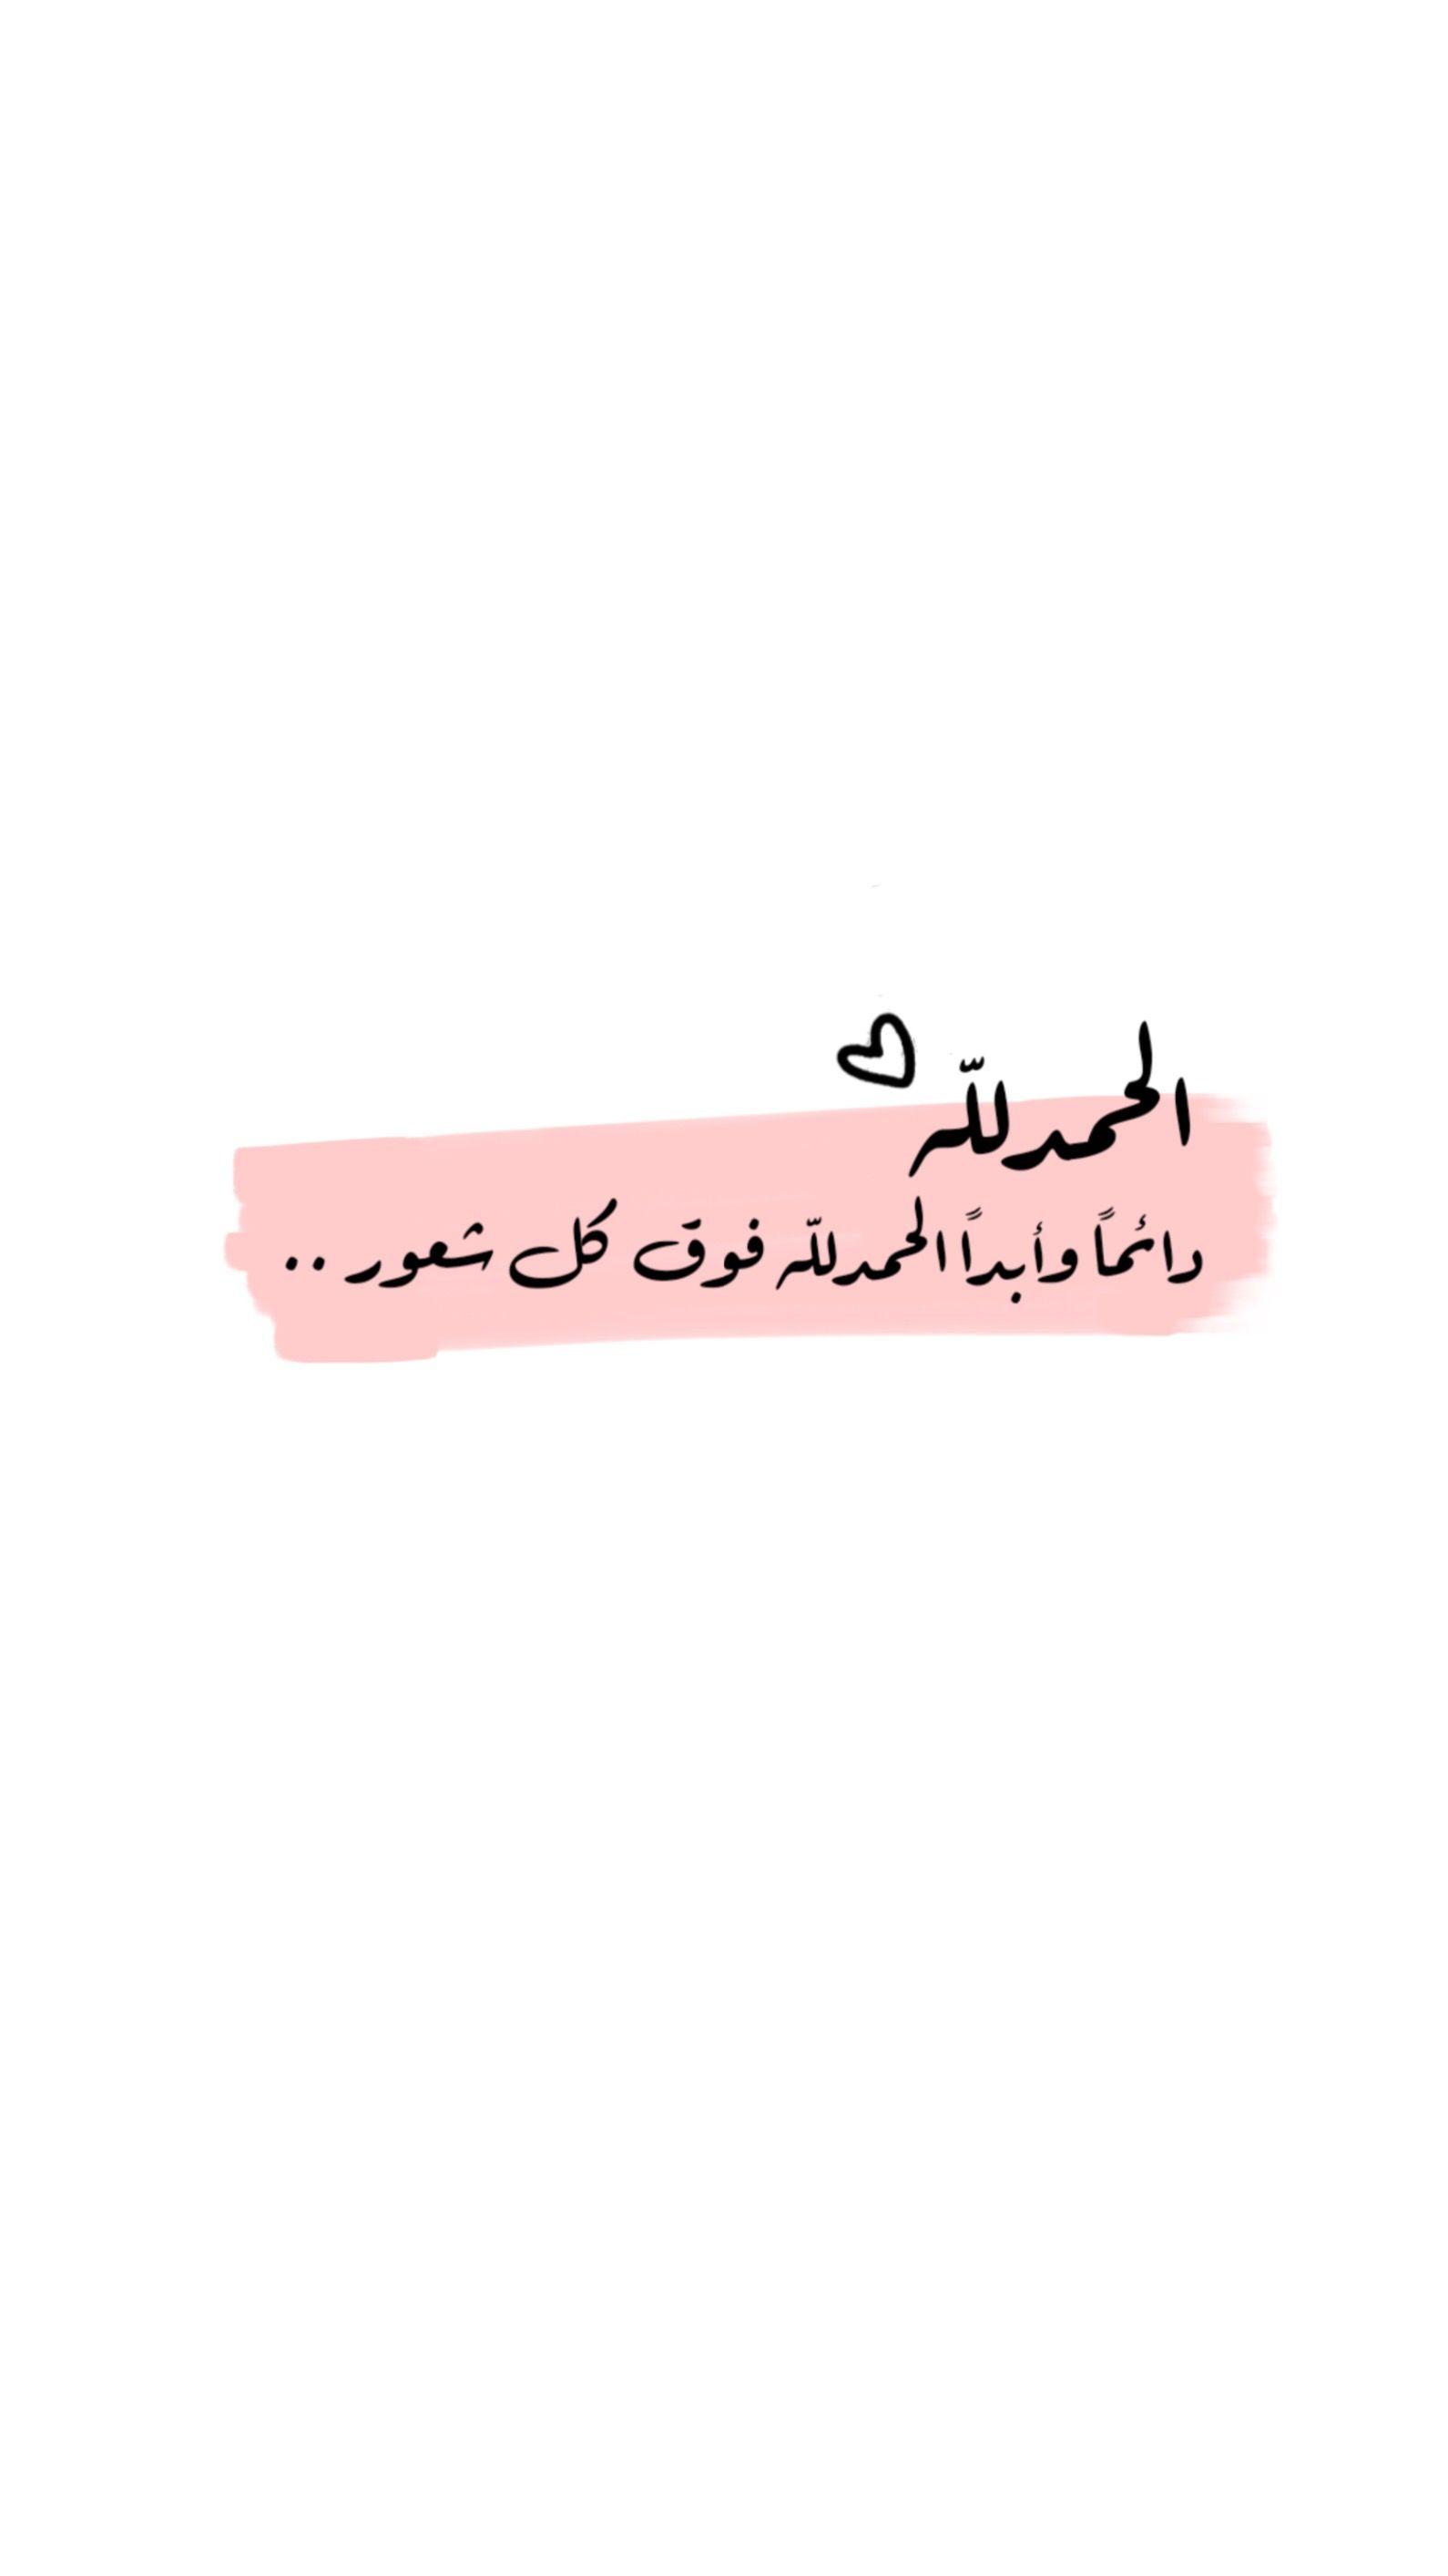 الحمدلله Calligraphy Quotes Love Beautiful Quran Quotes Quotes For Book Lovers